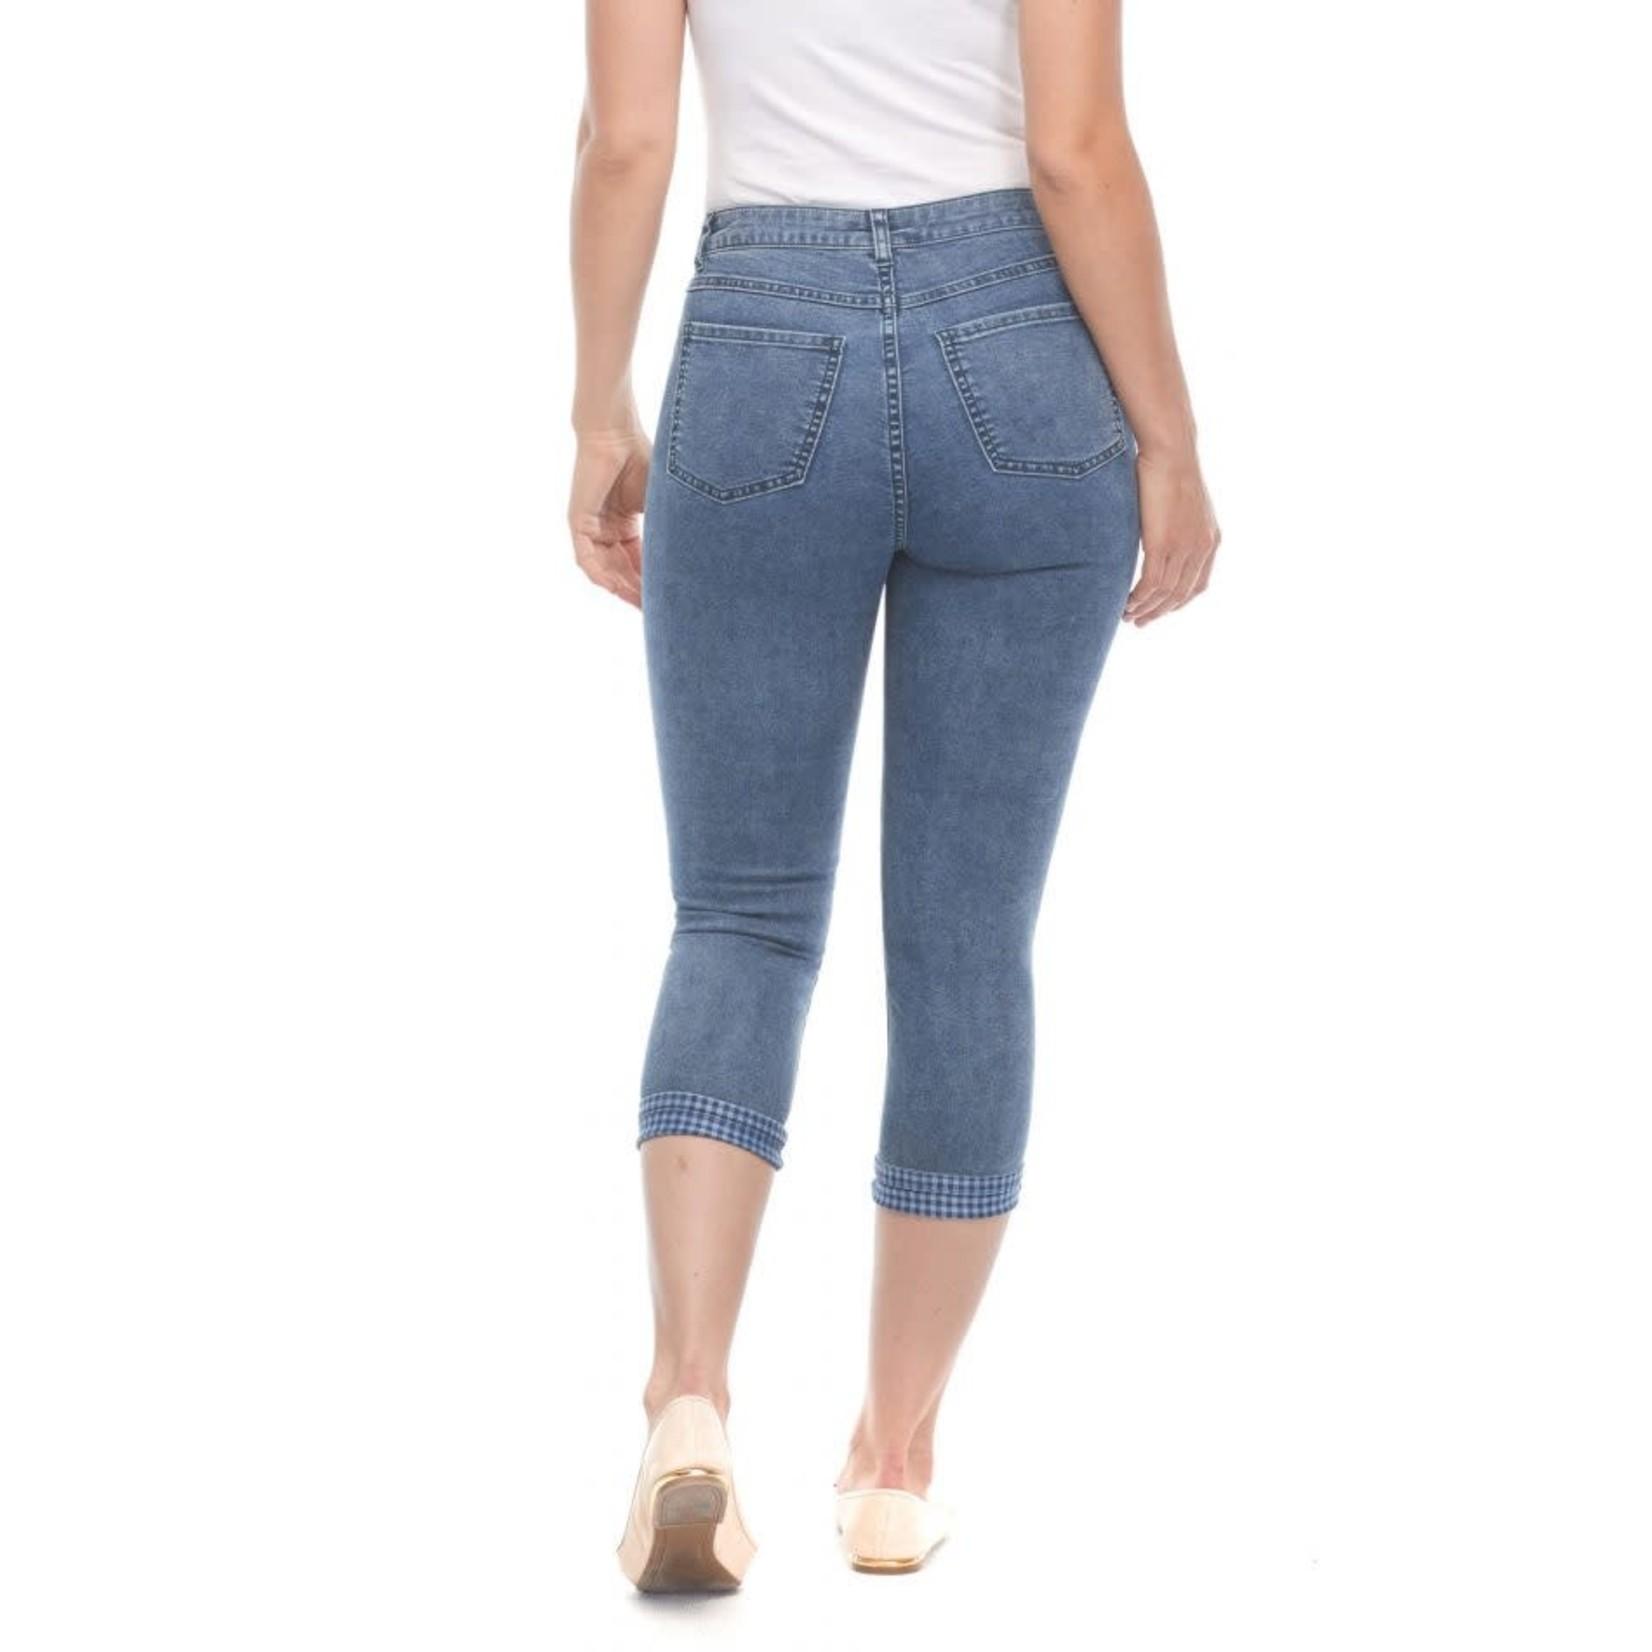 Olivia Slim Crop Reversible Denim/Gingham Jeans